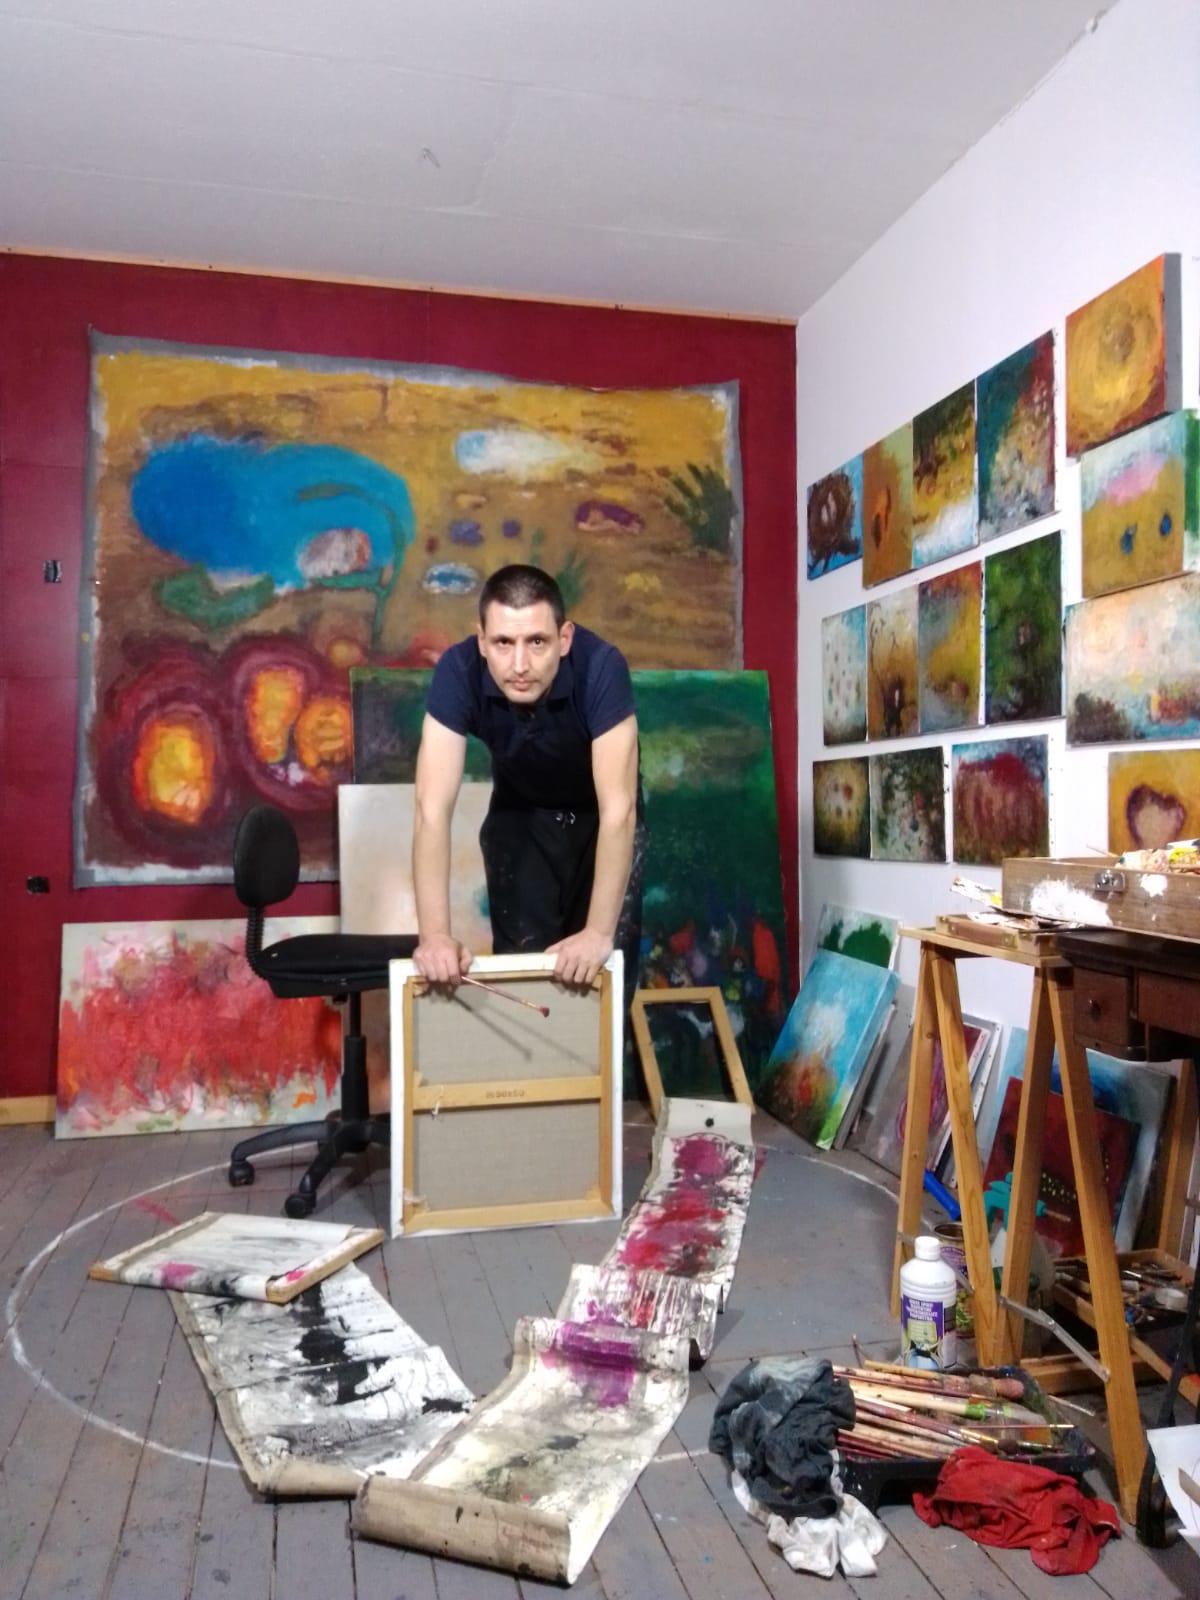 Galerie Mia Joosten